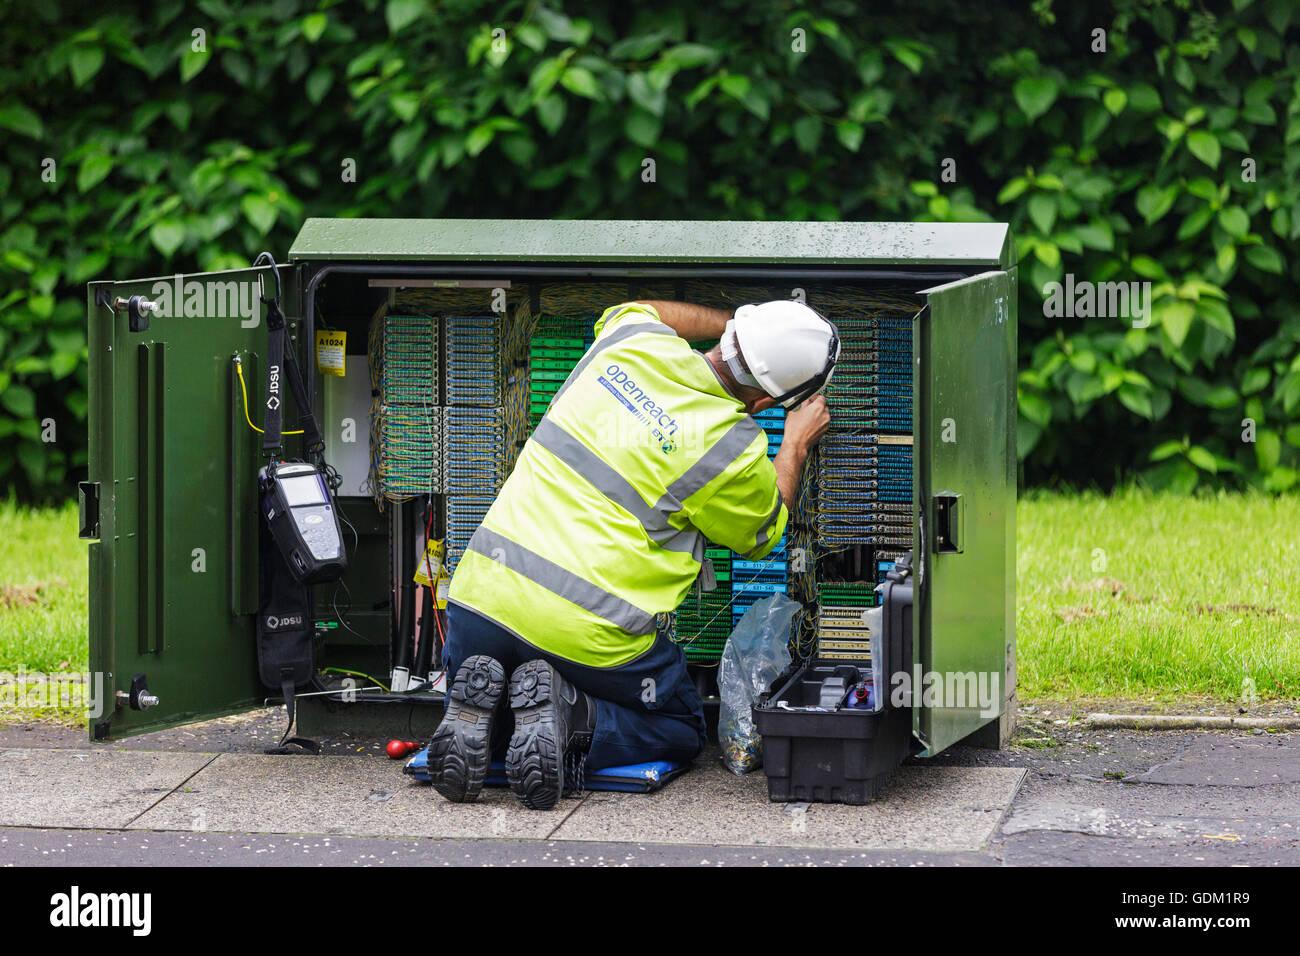 Openreach telephone and internet technician repairing a switch box, Scotland, UK - Stock Image